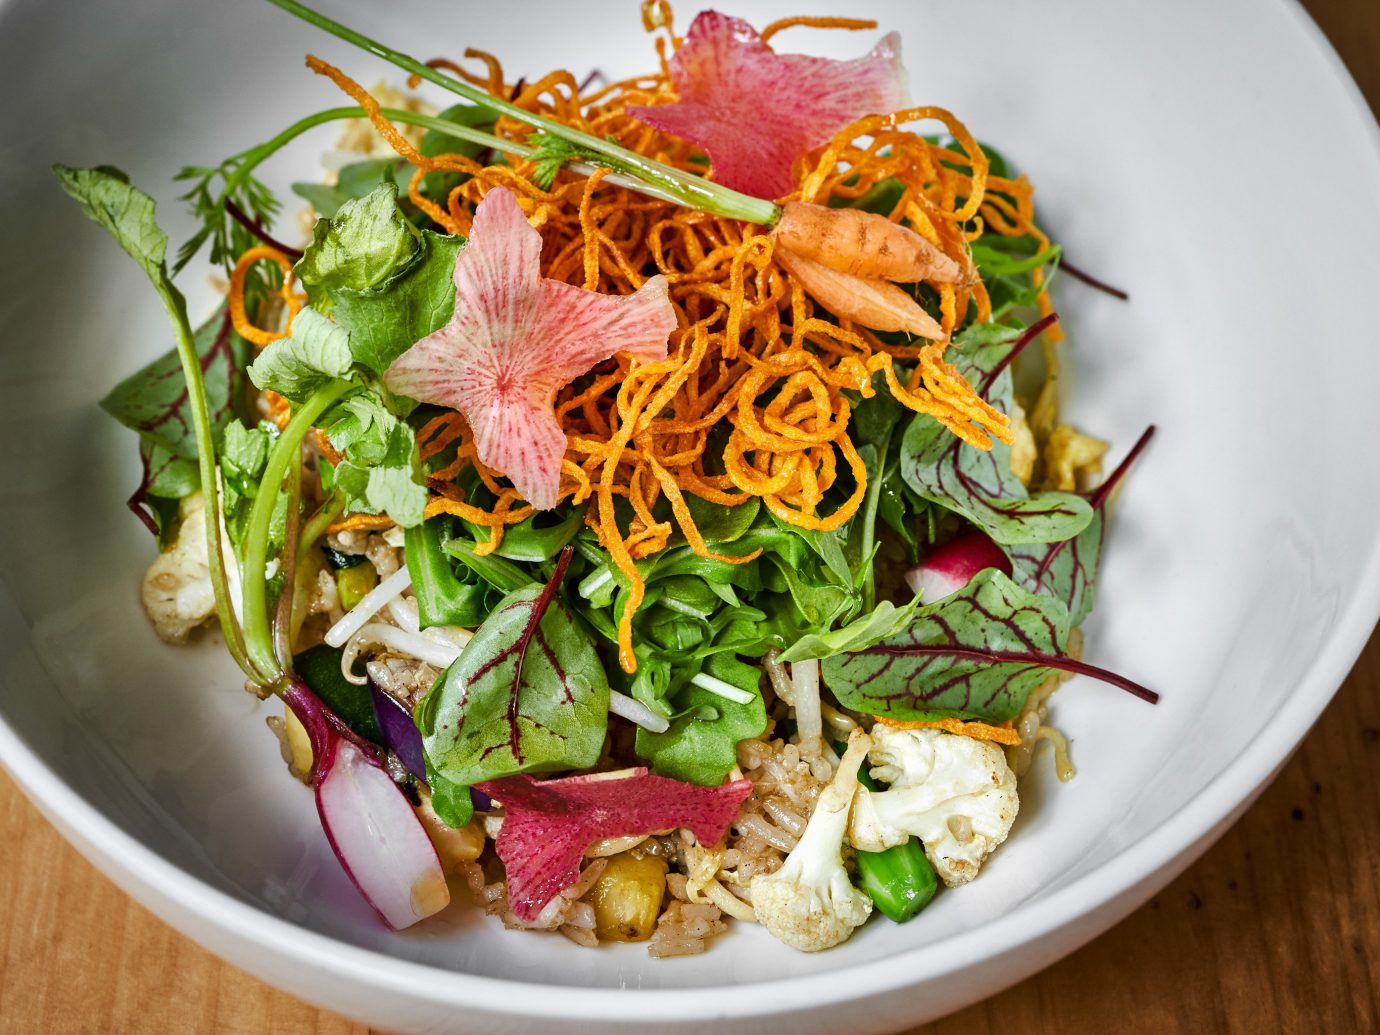 Food + Drink plate food table dish bowl salad vegetarian food cuisine vegetable asian food thai food recipe leaf vegetable meal containing fresh